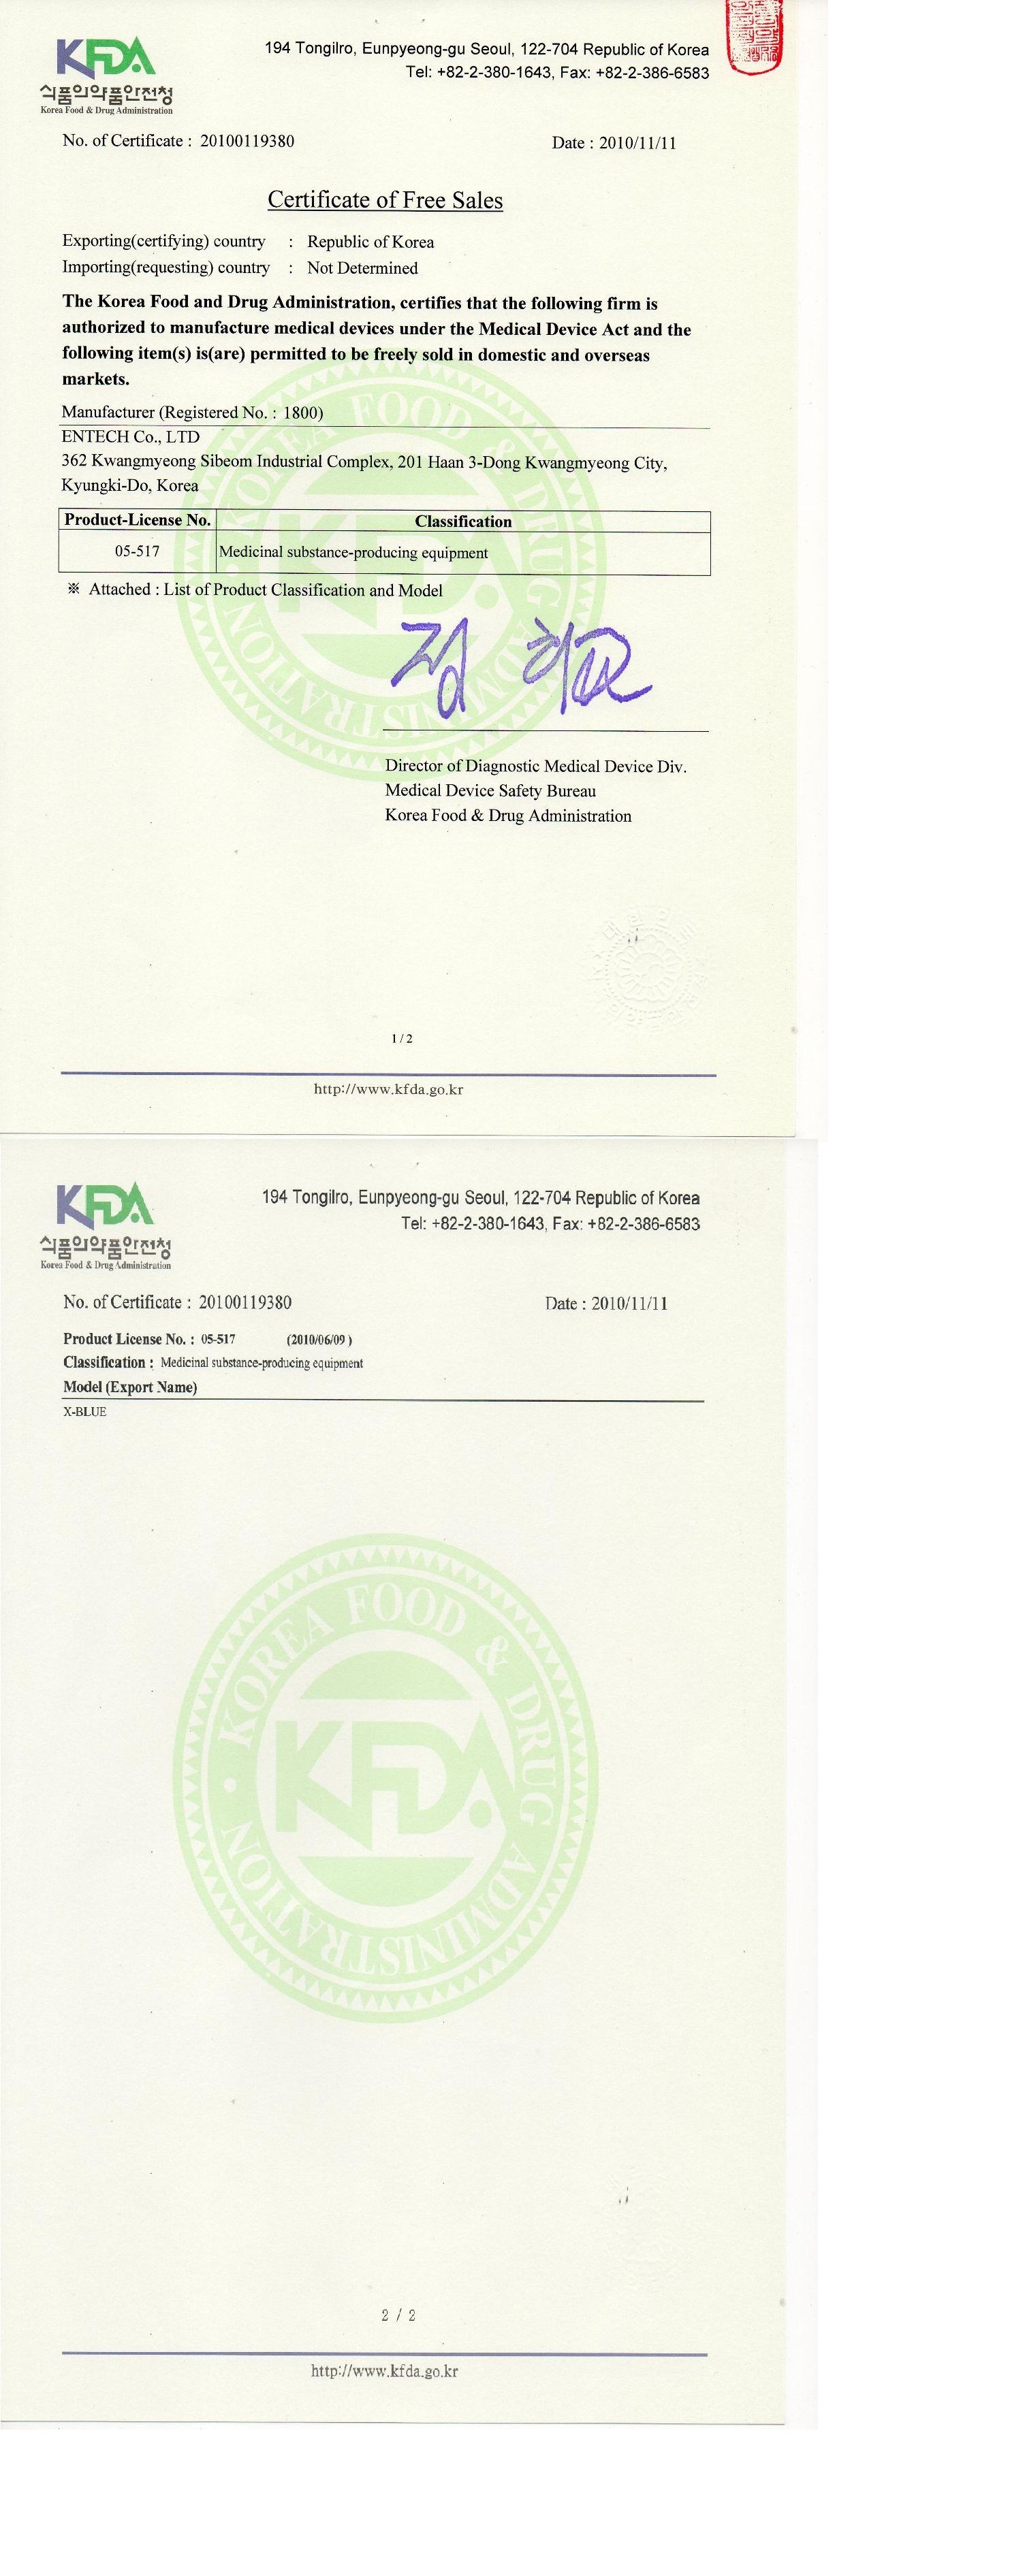 Nexus x blue water ionizer alkaline water plus ce certification nrtl certification kfda certification xflitez Choice Image